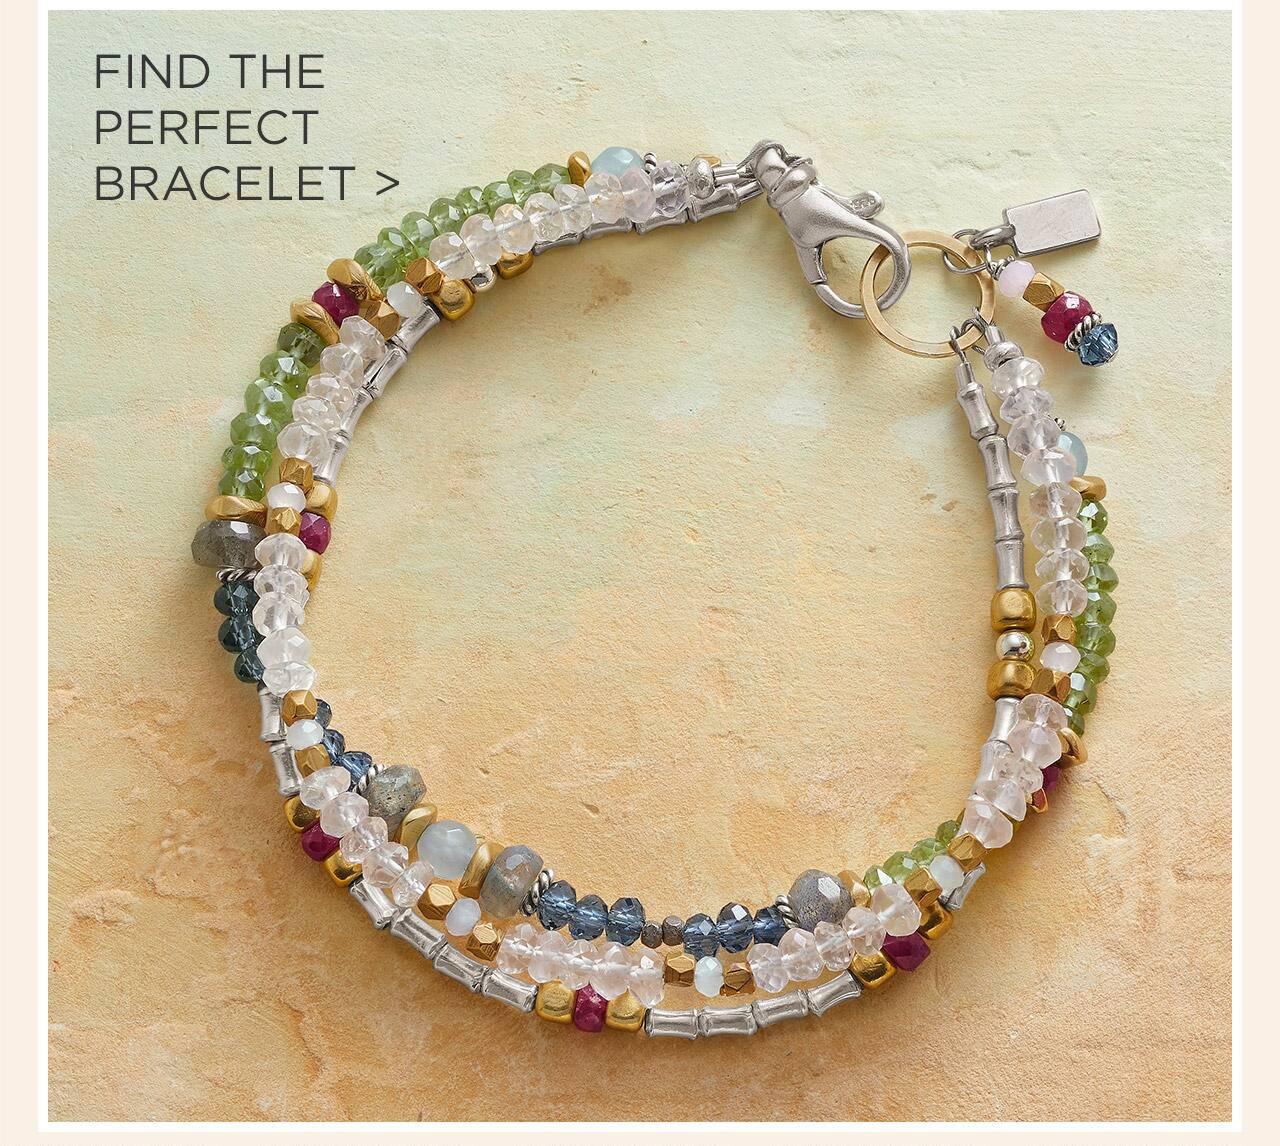 The Perfect Bracelet